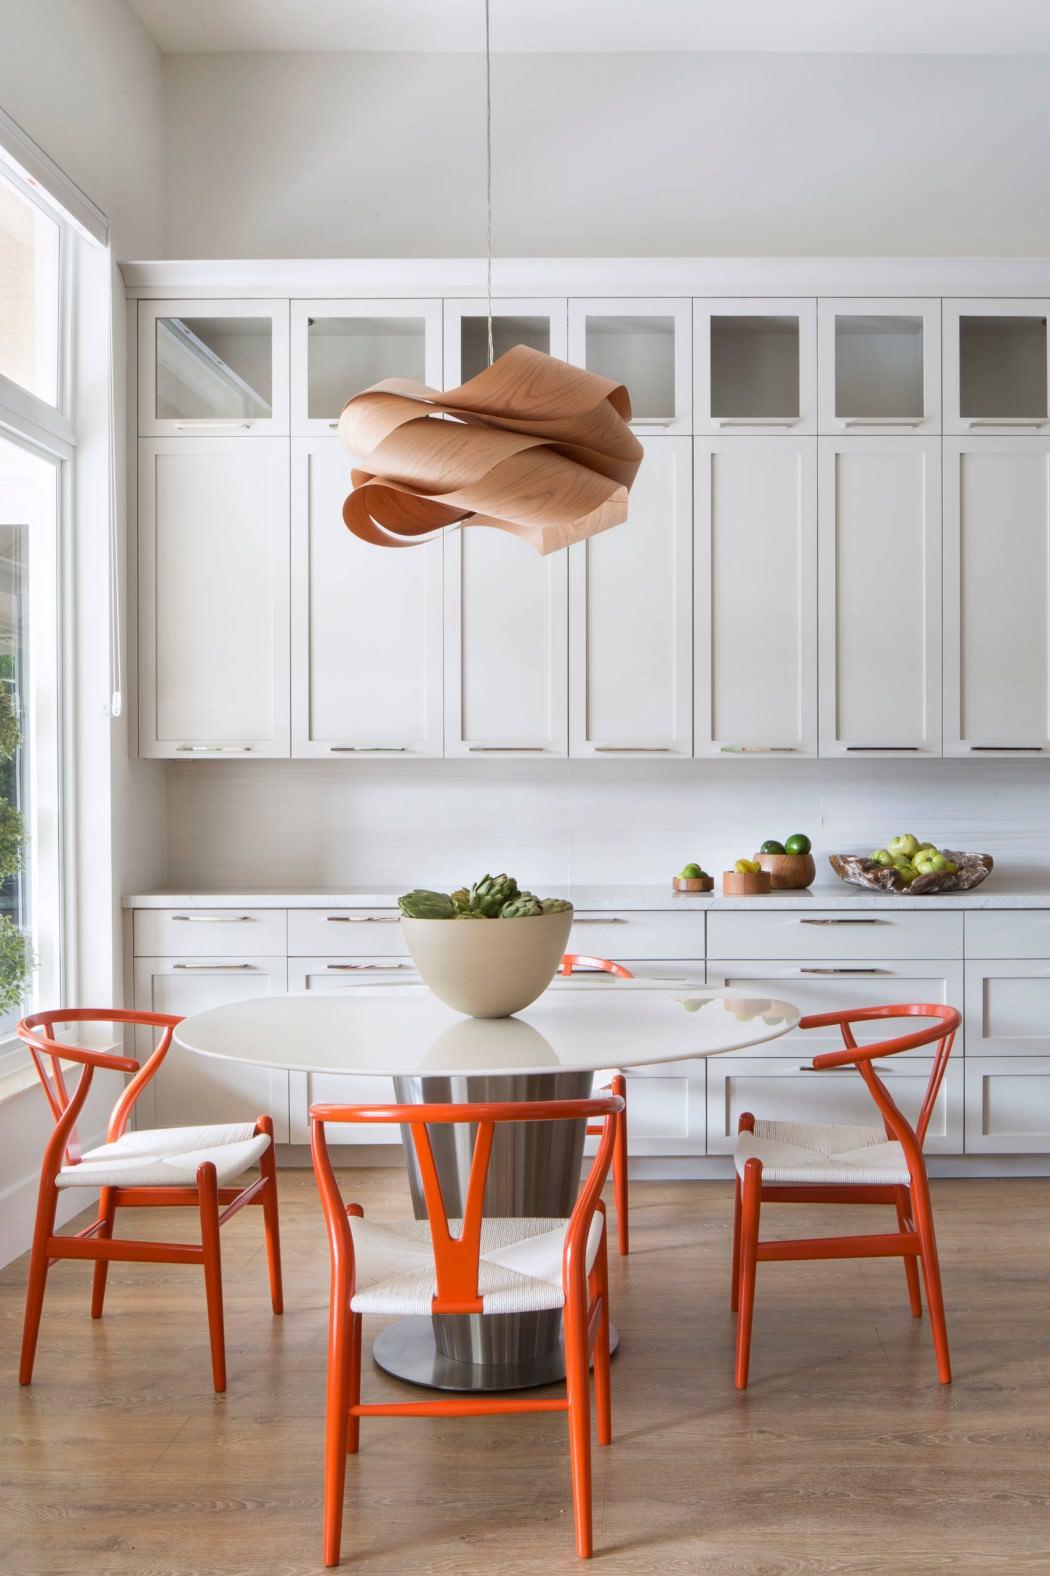 Извилистая форма люстры на кухне